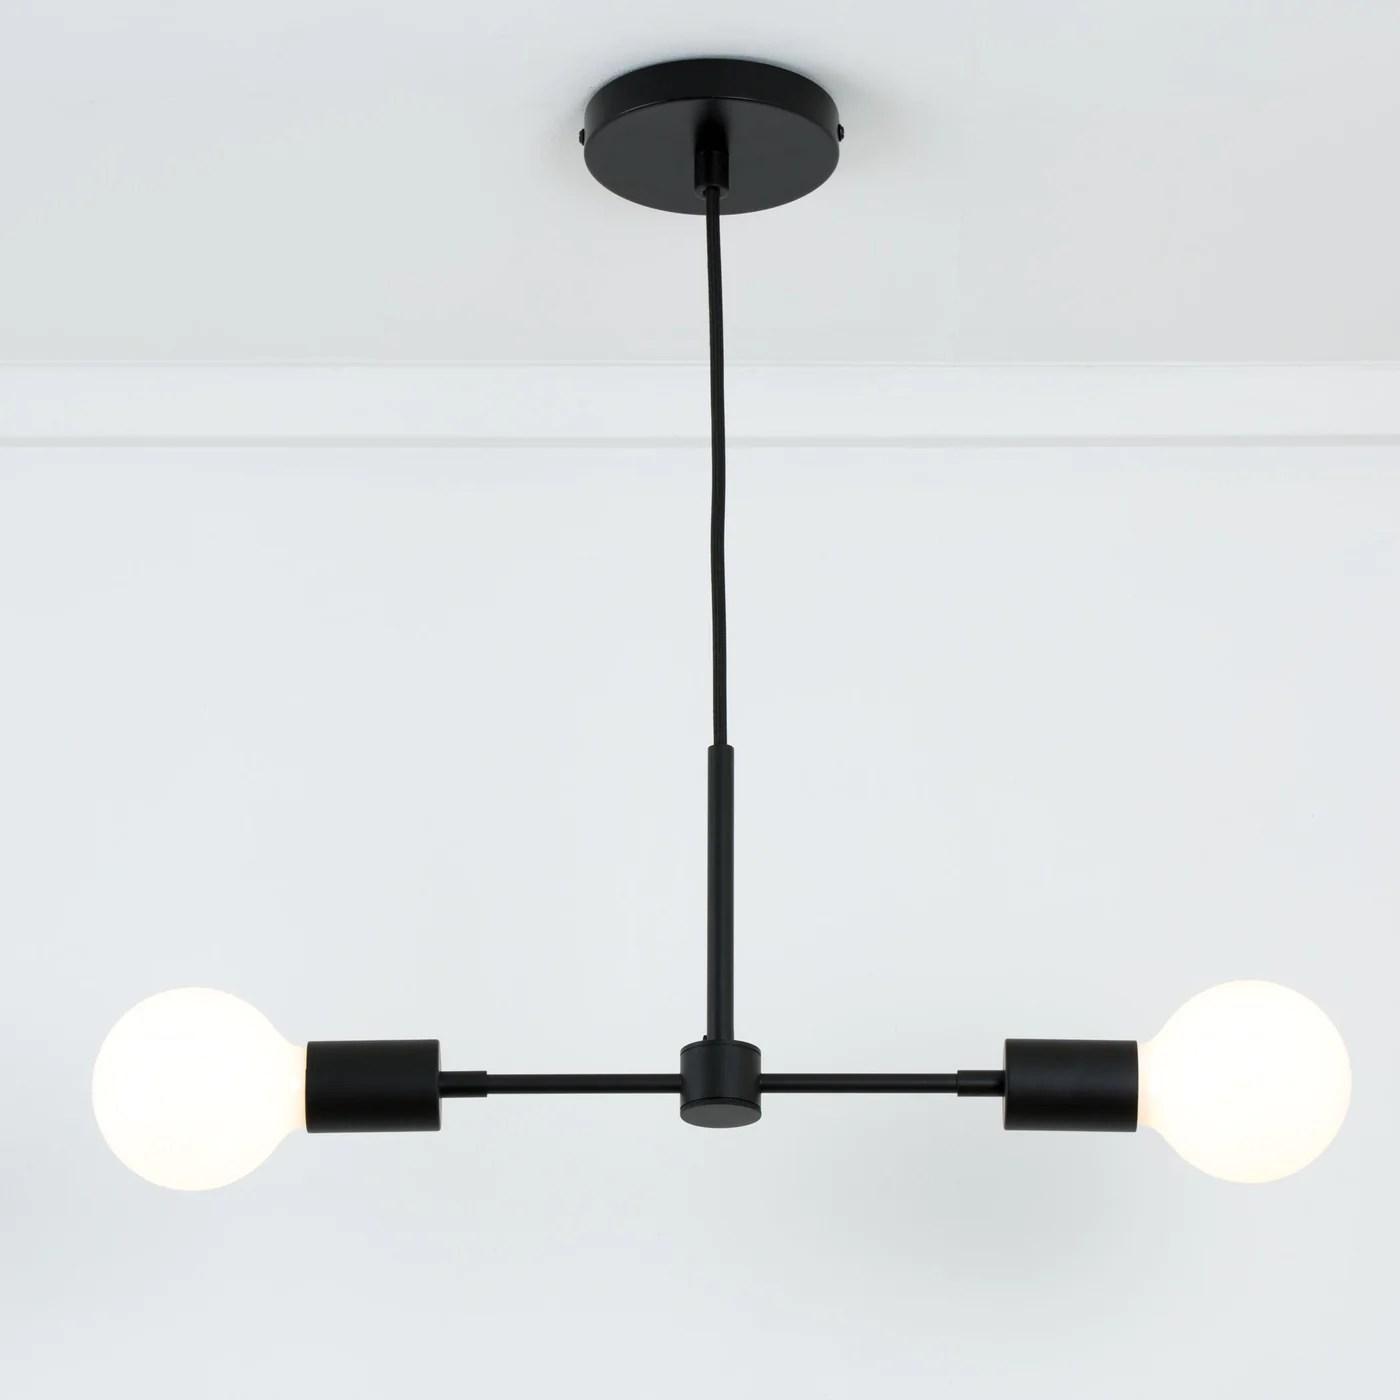 medium resolution of pendant light fixture google patents on wiring led light fixtures wiring diagram go